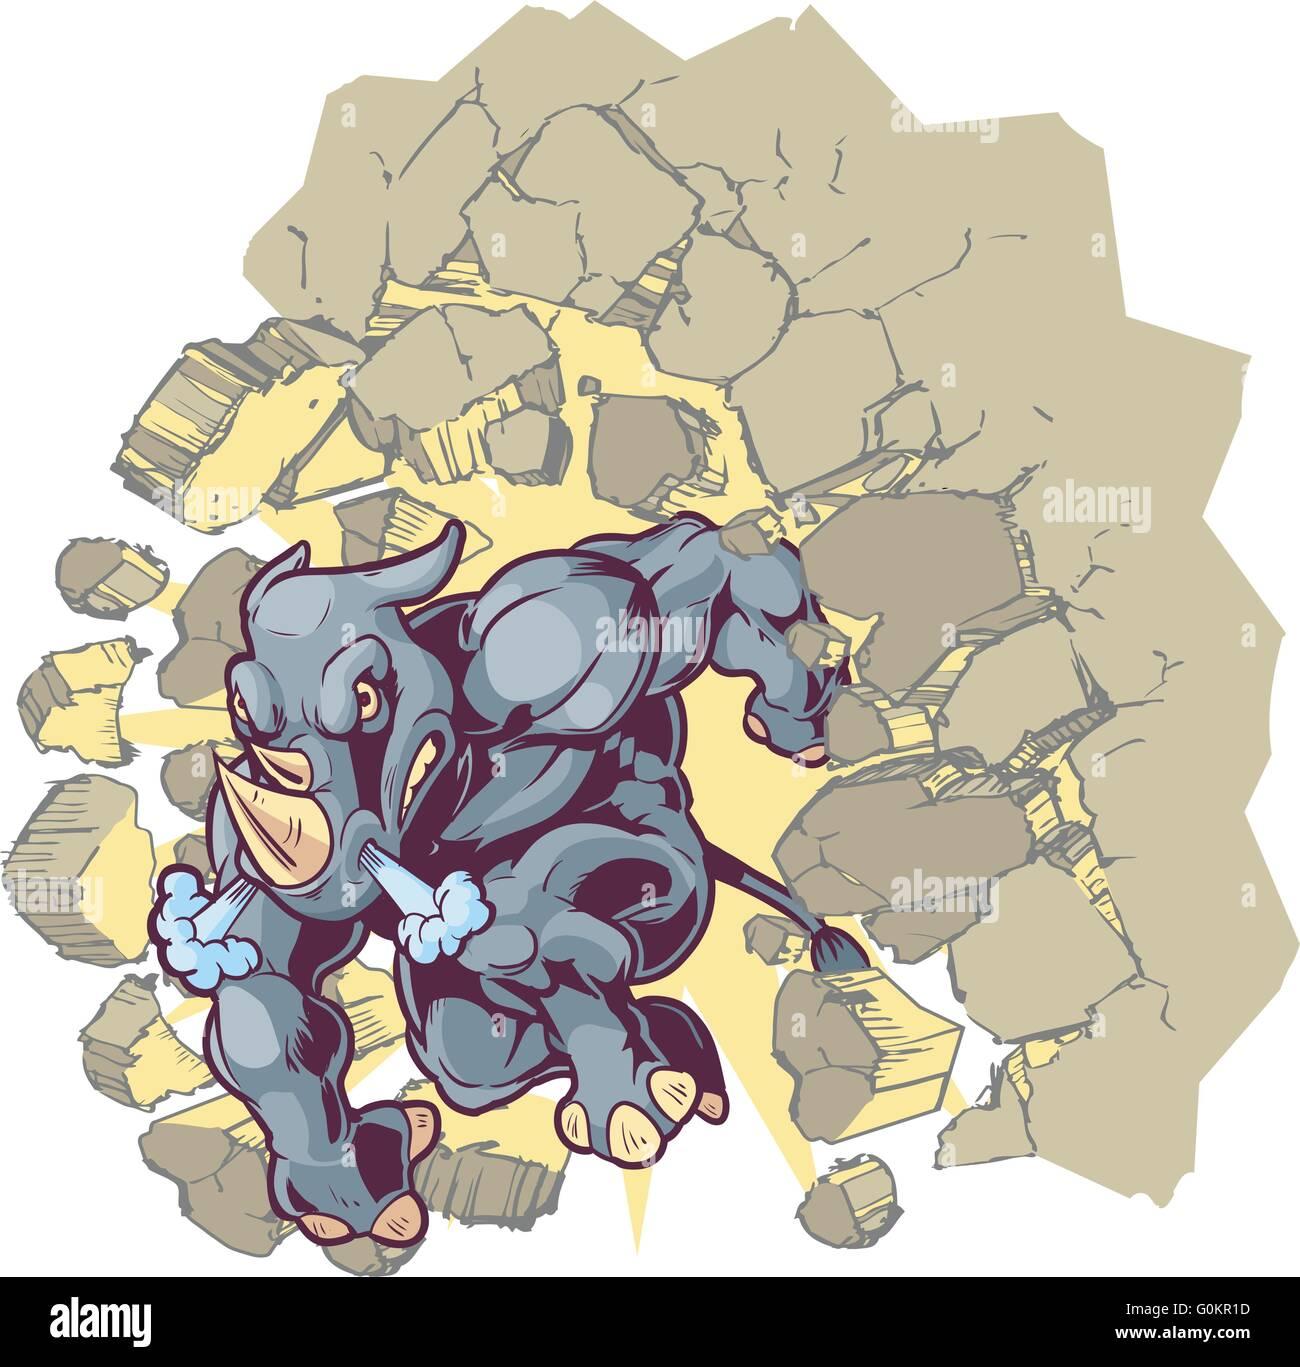 Vector Cartoon Clip Art Illustration of a Crouching Anthropomorphic Mascot Rhino Crashing through a wall. - Stock Image